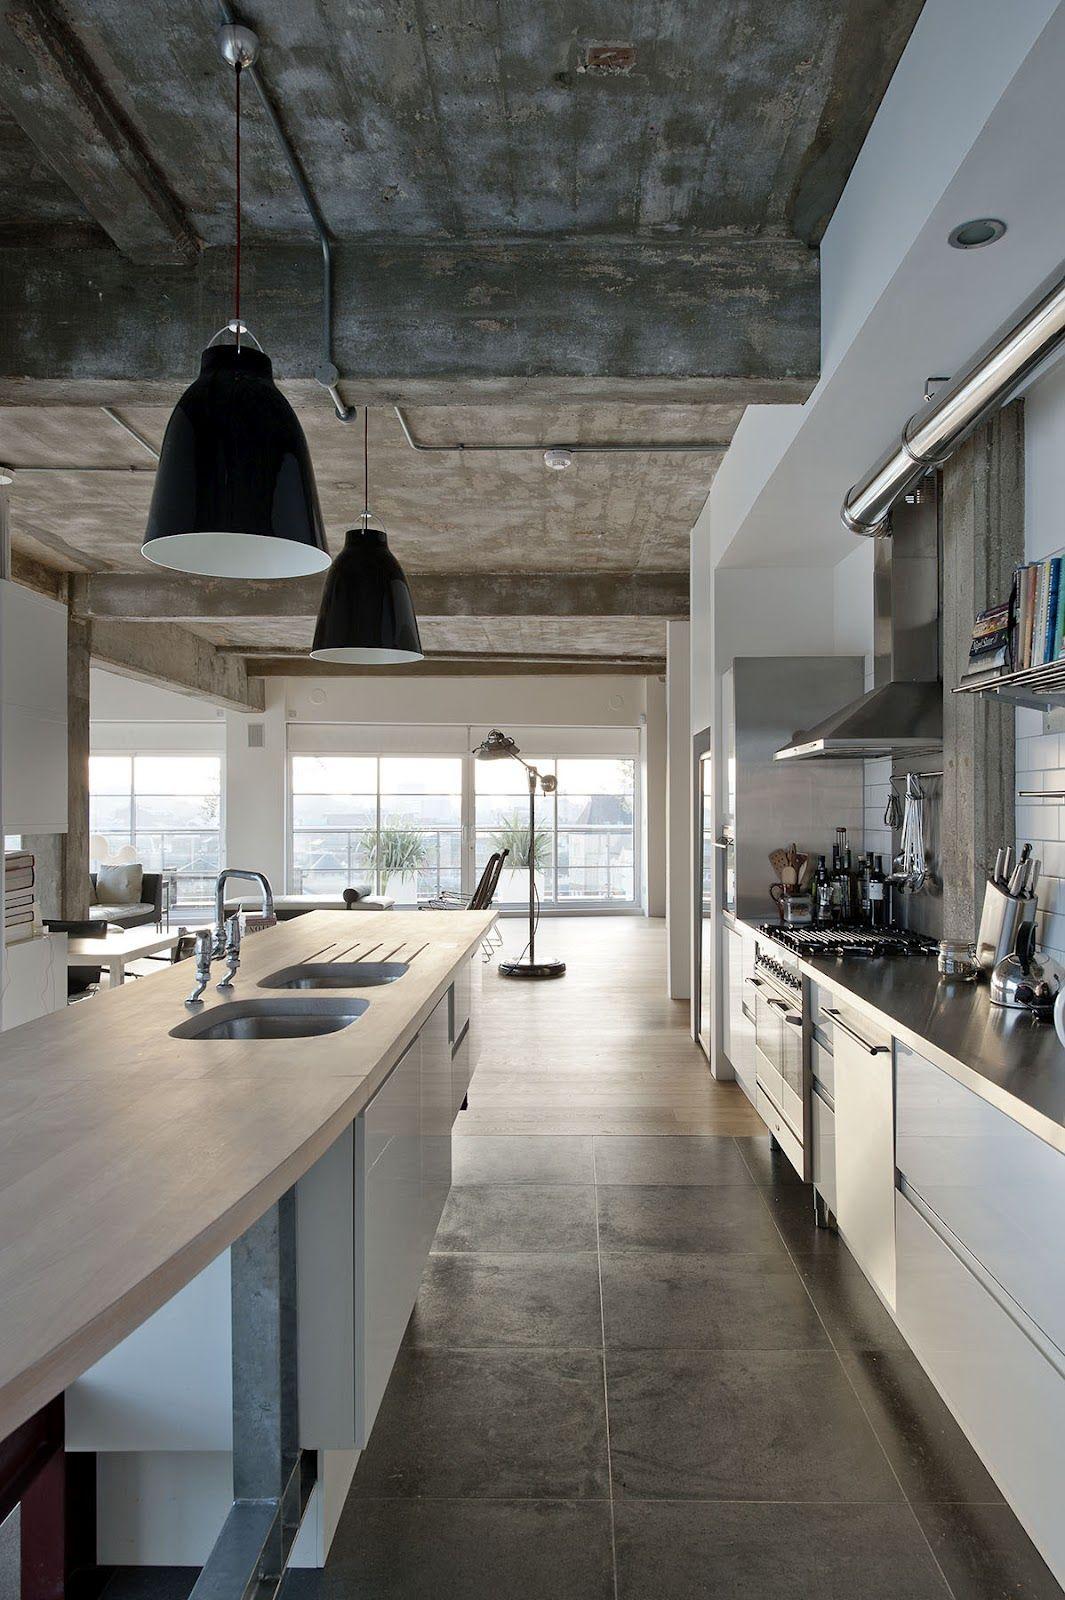 industrial-lofts-inspiration-london-2 | Living Interiors | Pinterest ...